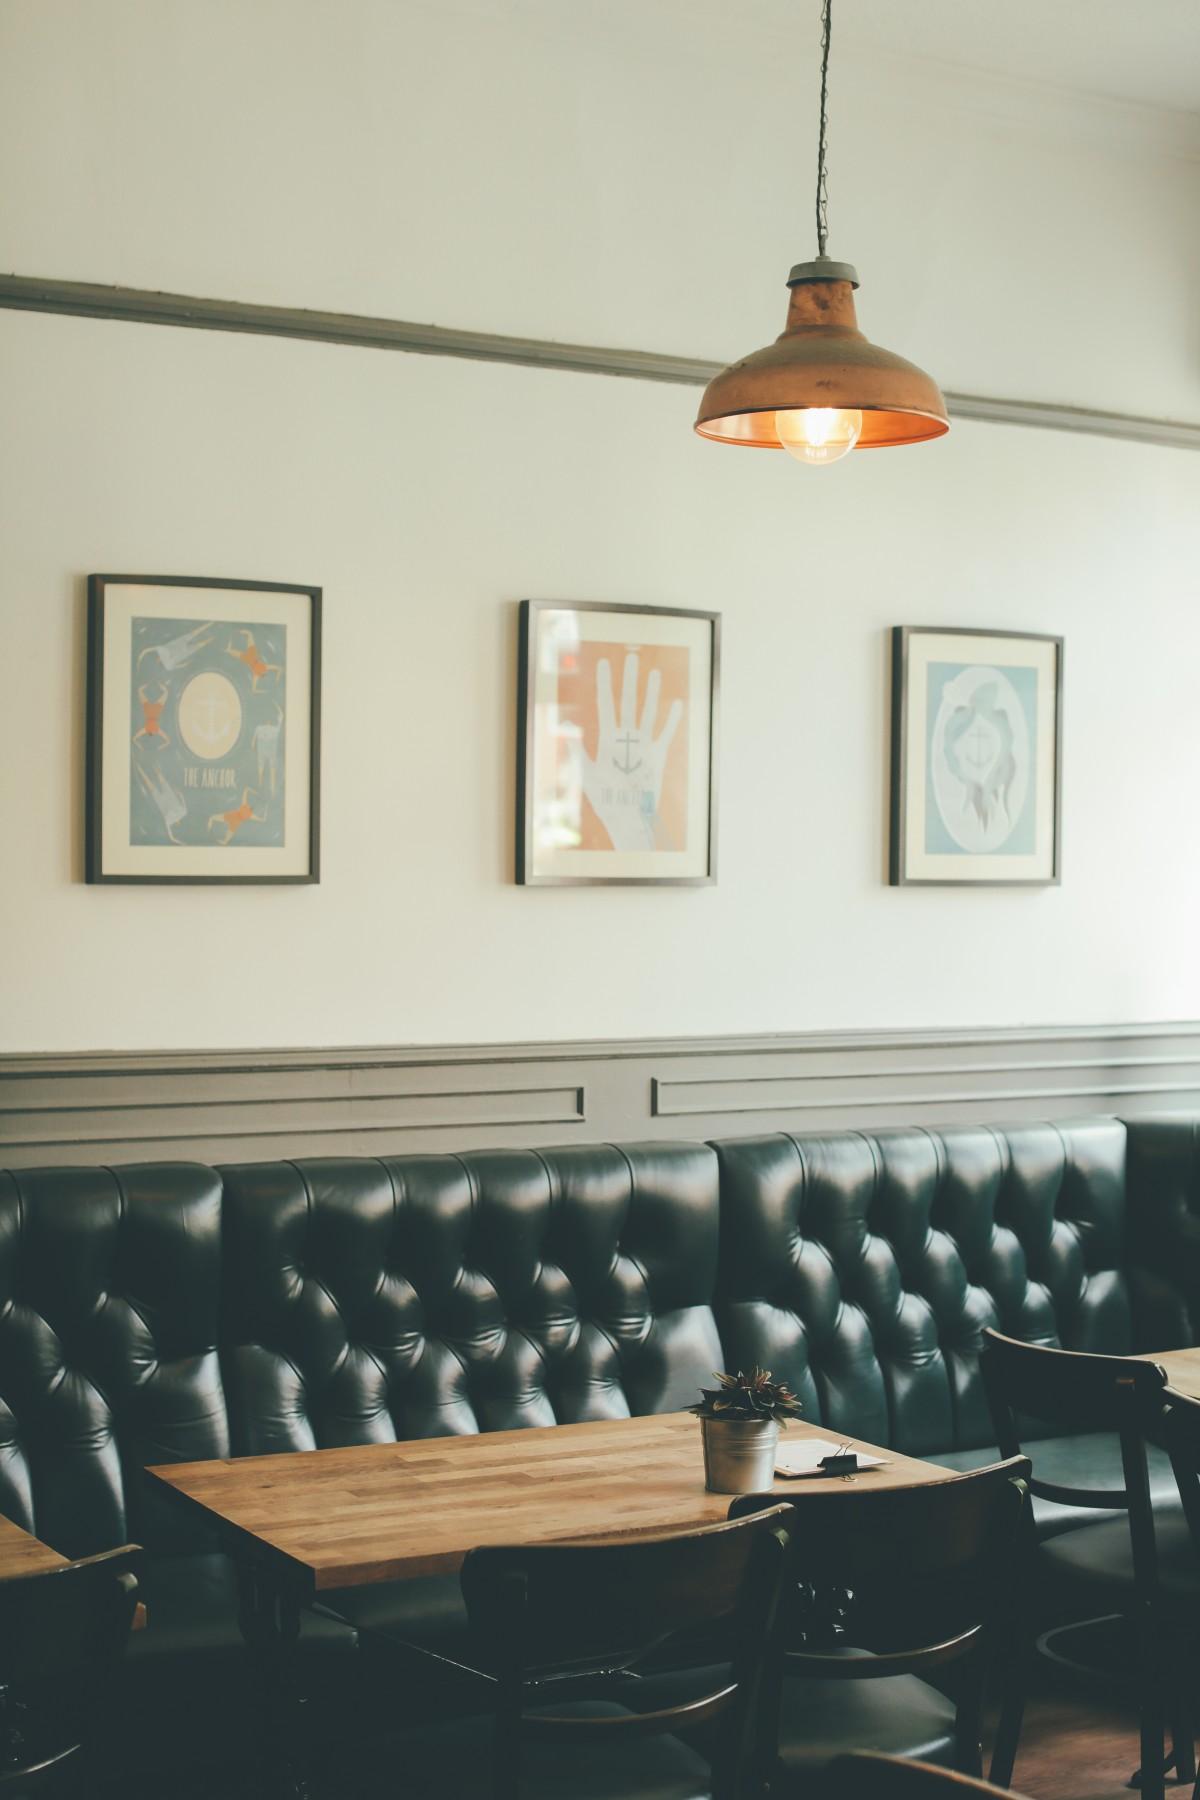 banc restaurant maison plafond